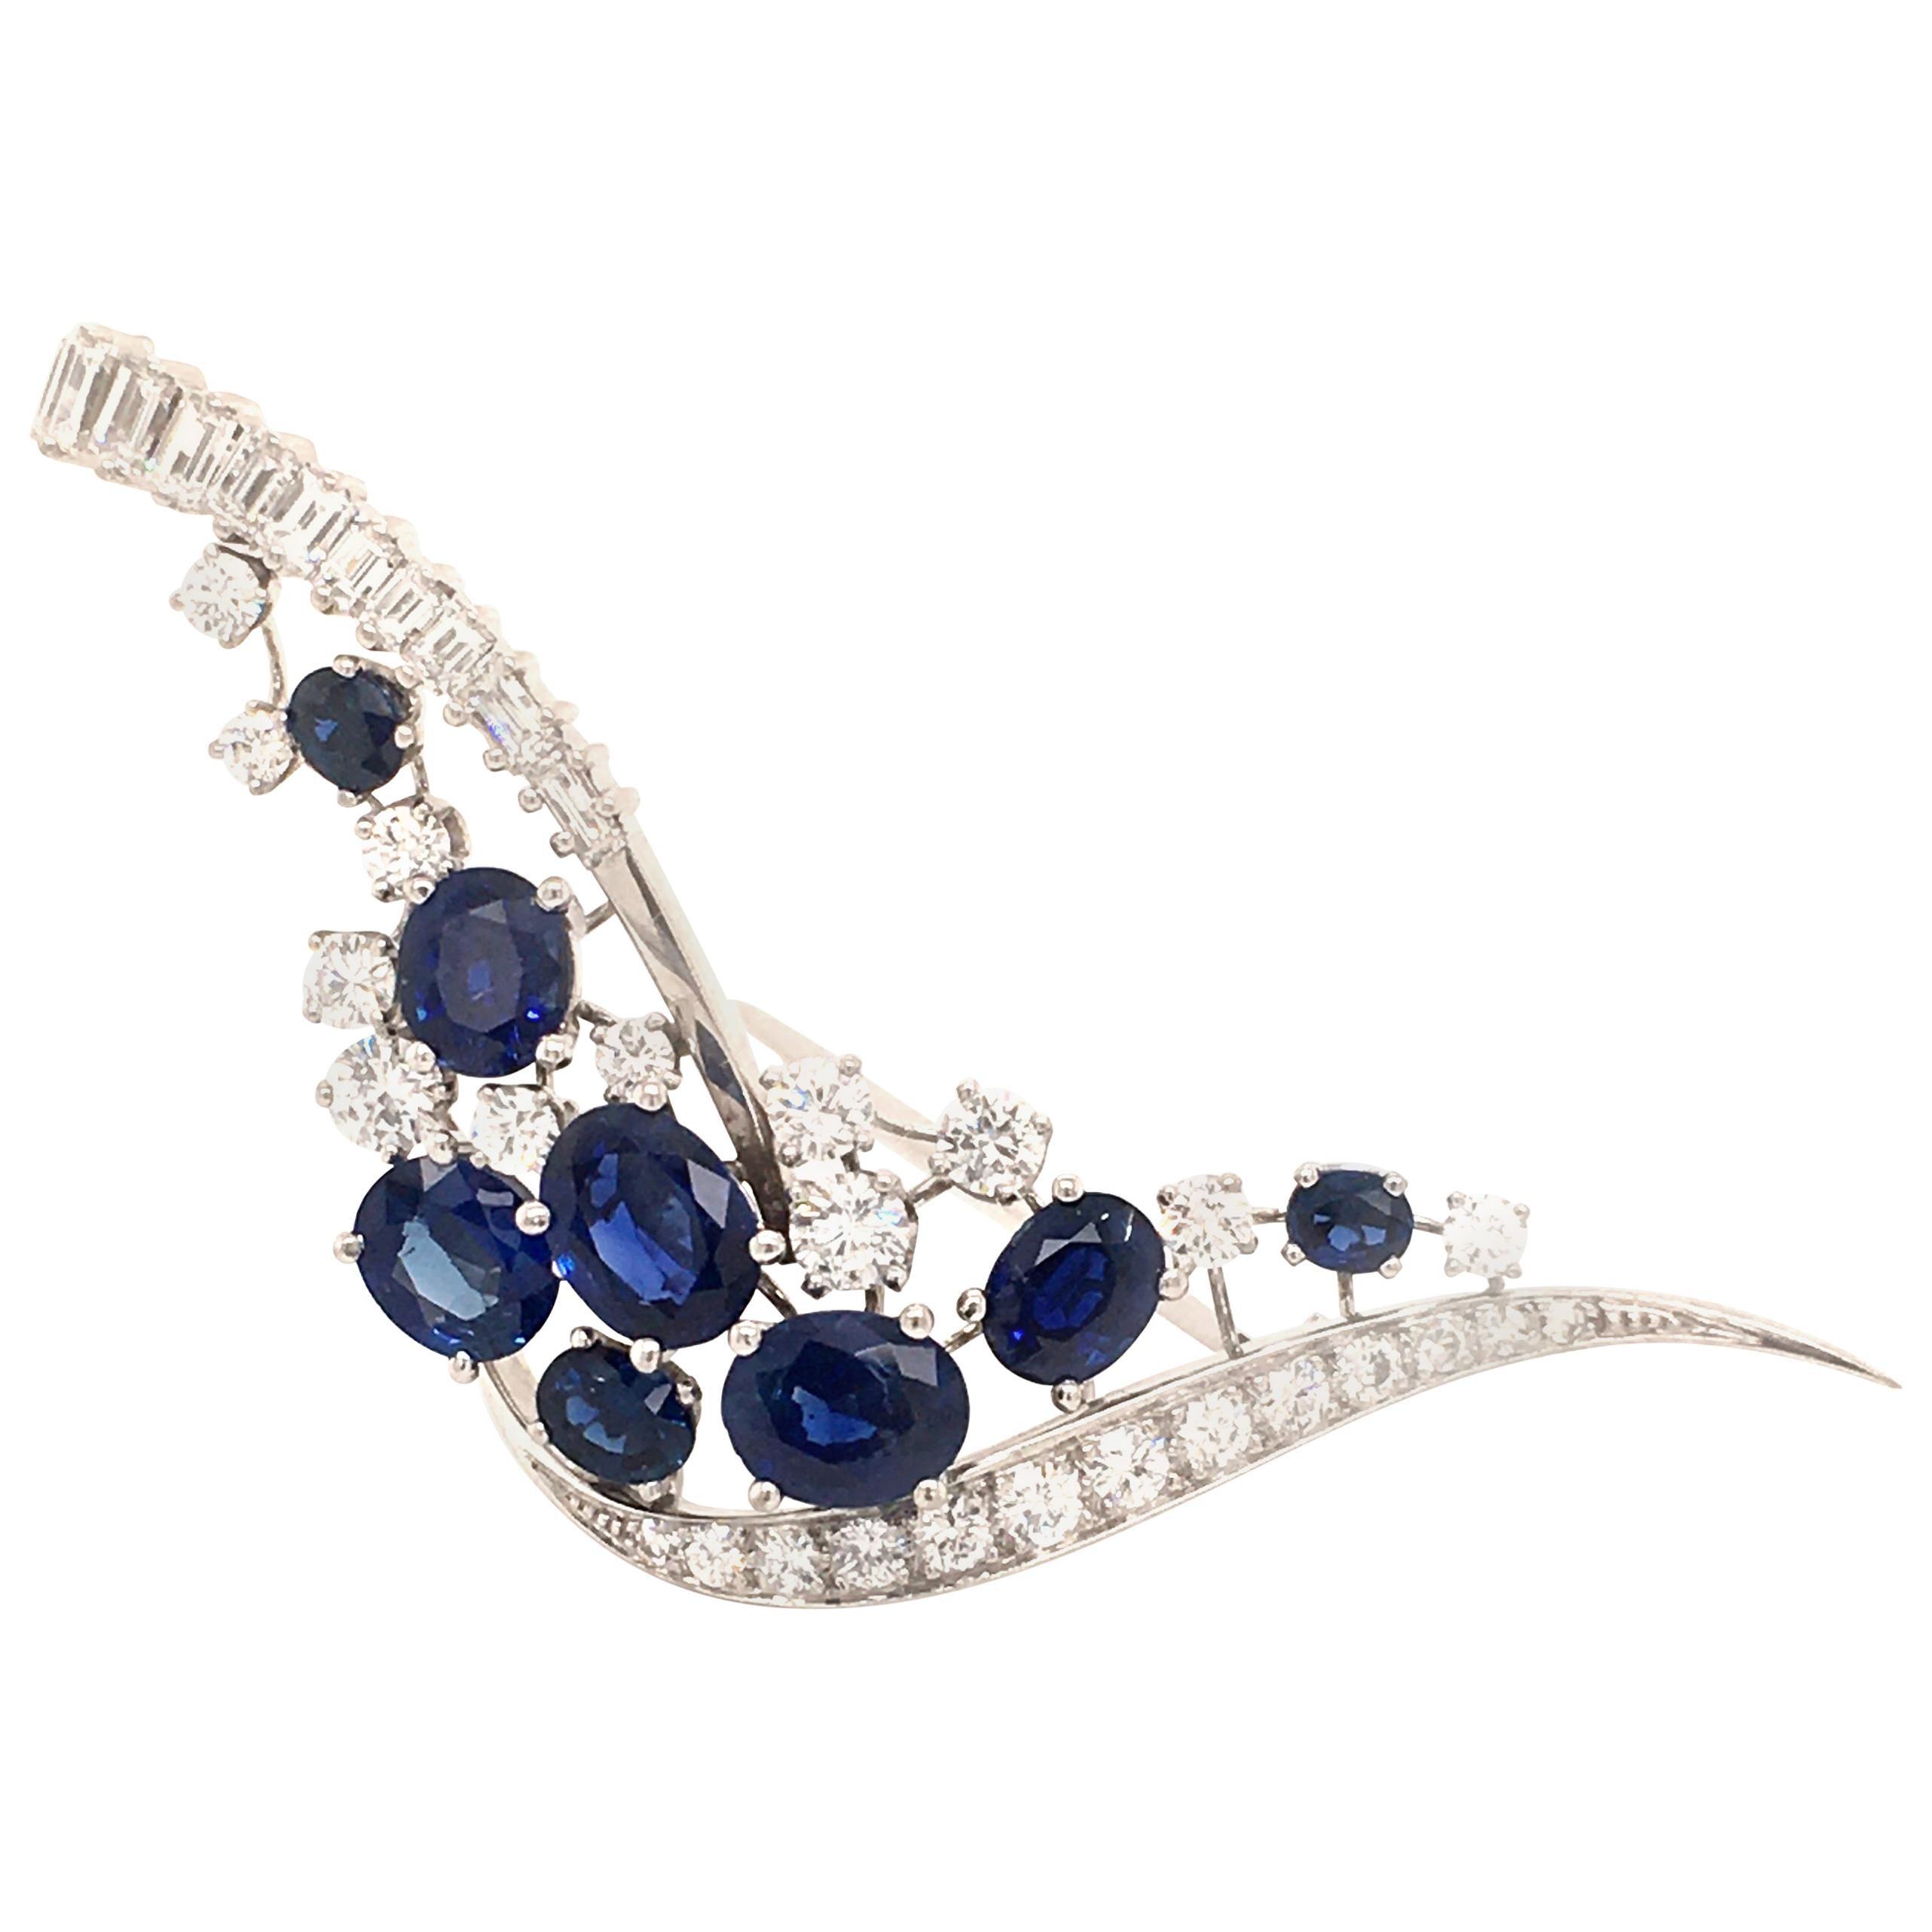 Sapphire and Diamond Brooch in 18 Karat White Gold